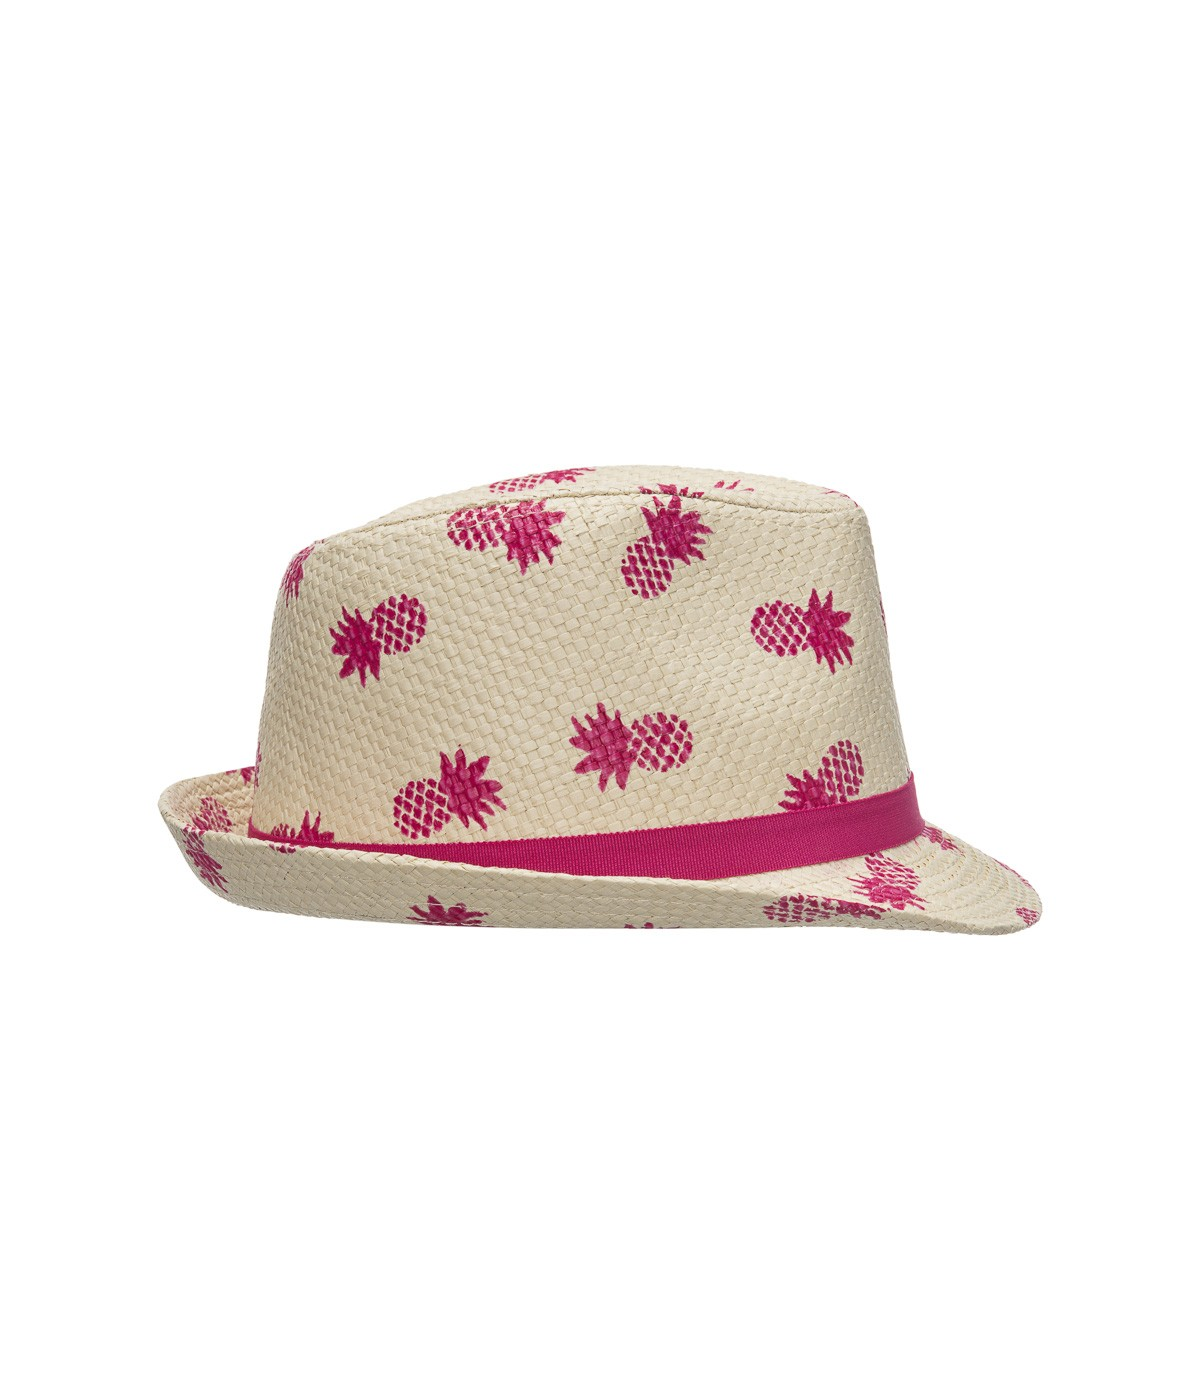 Girls Pineapple Hat